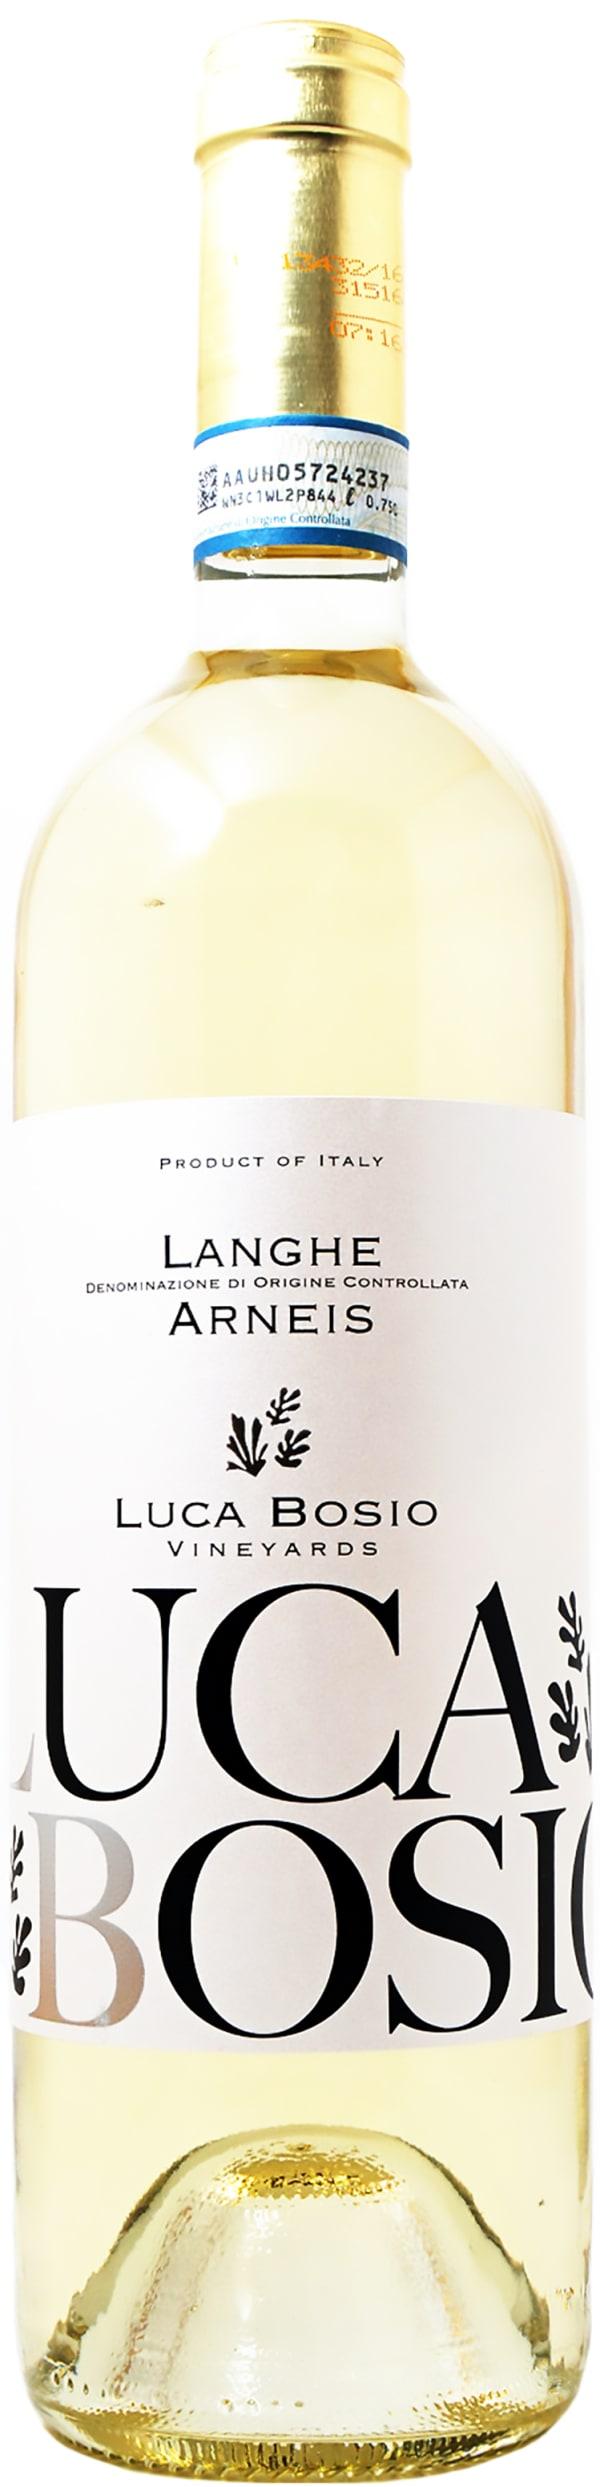 Luca Bosio Langhe Arneis 2019